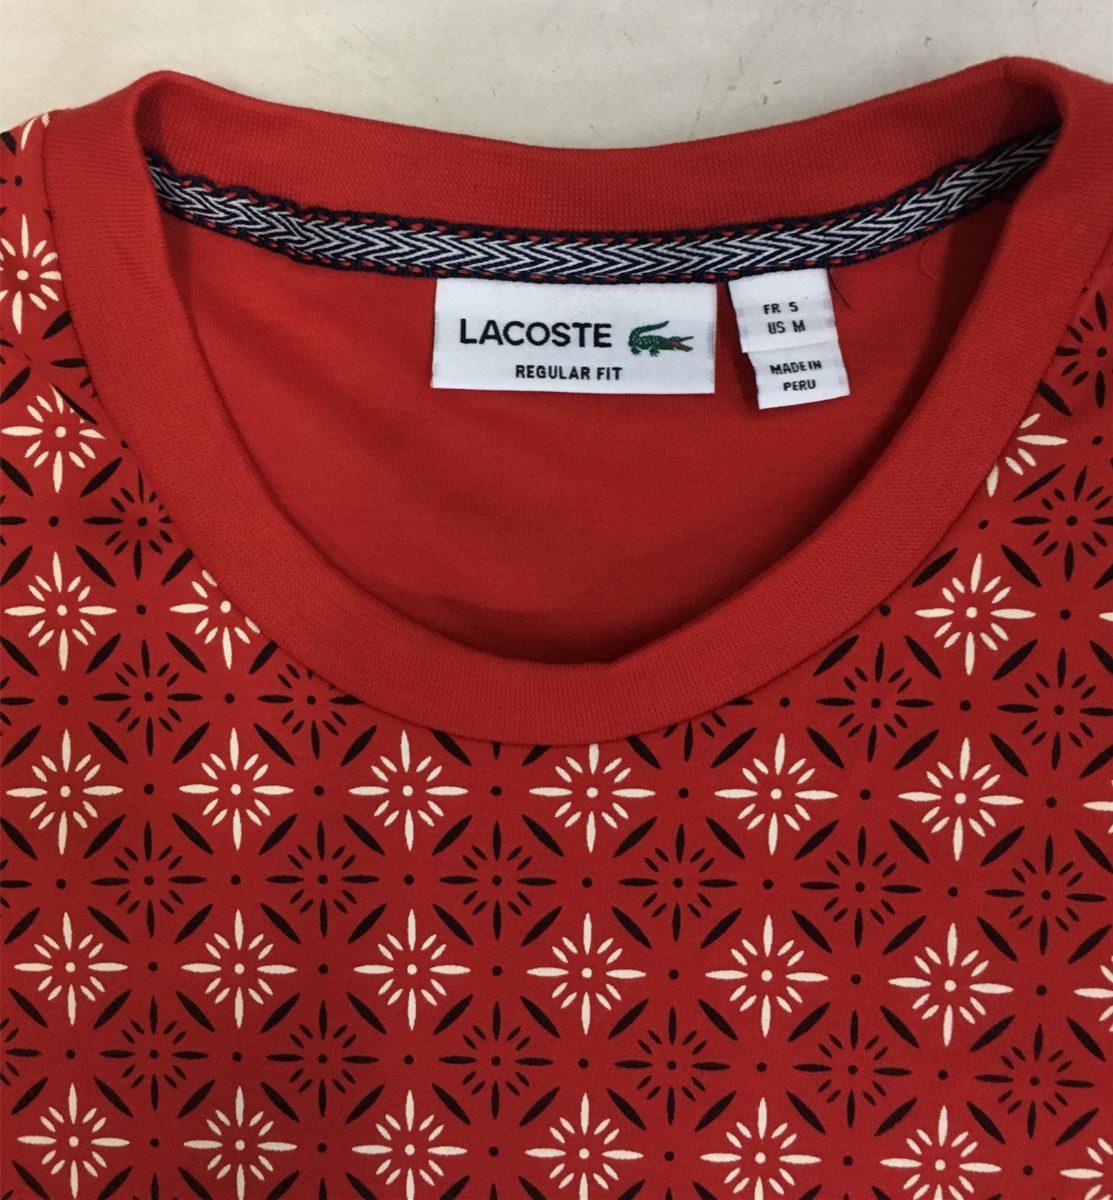 64044afc148 camiseta masculina lacoste slimfit live - importada peruana. Carregando  zoom.